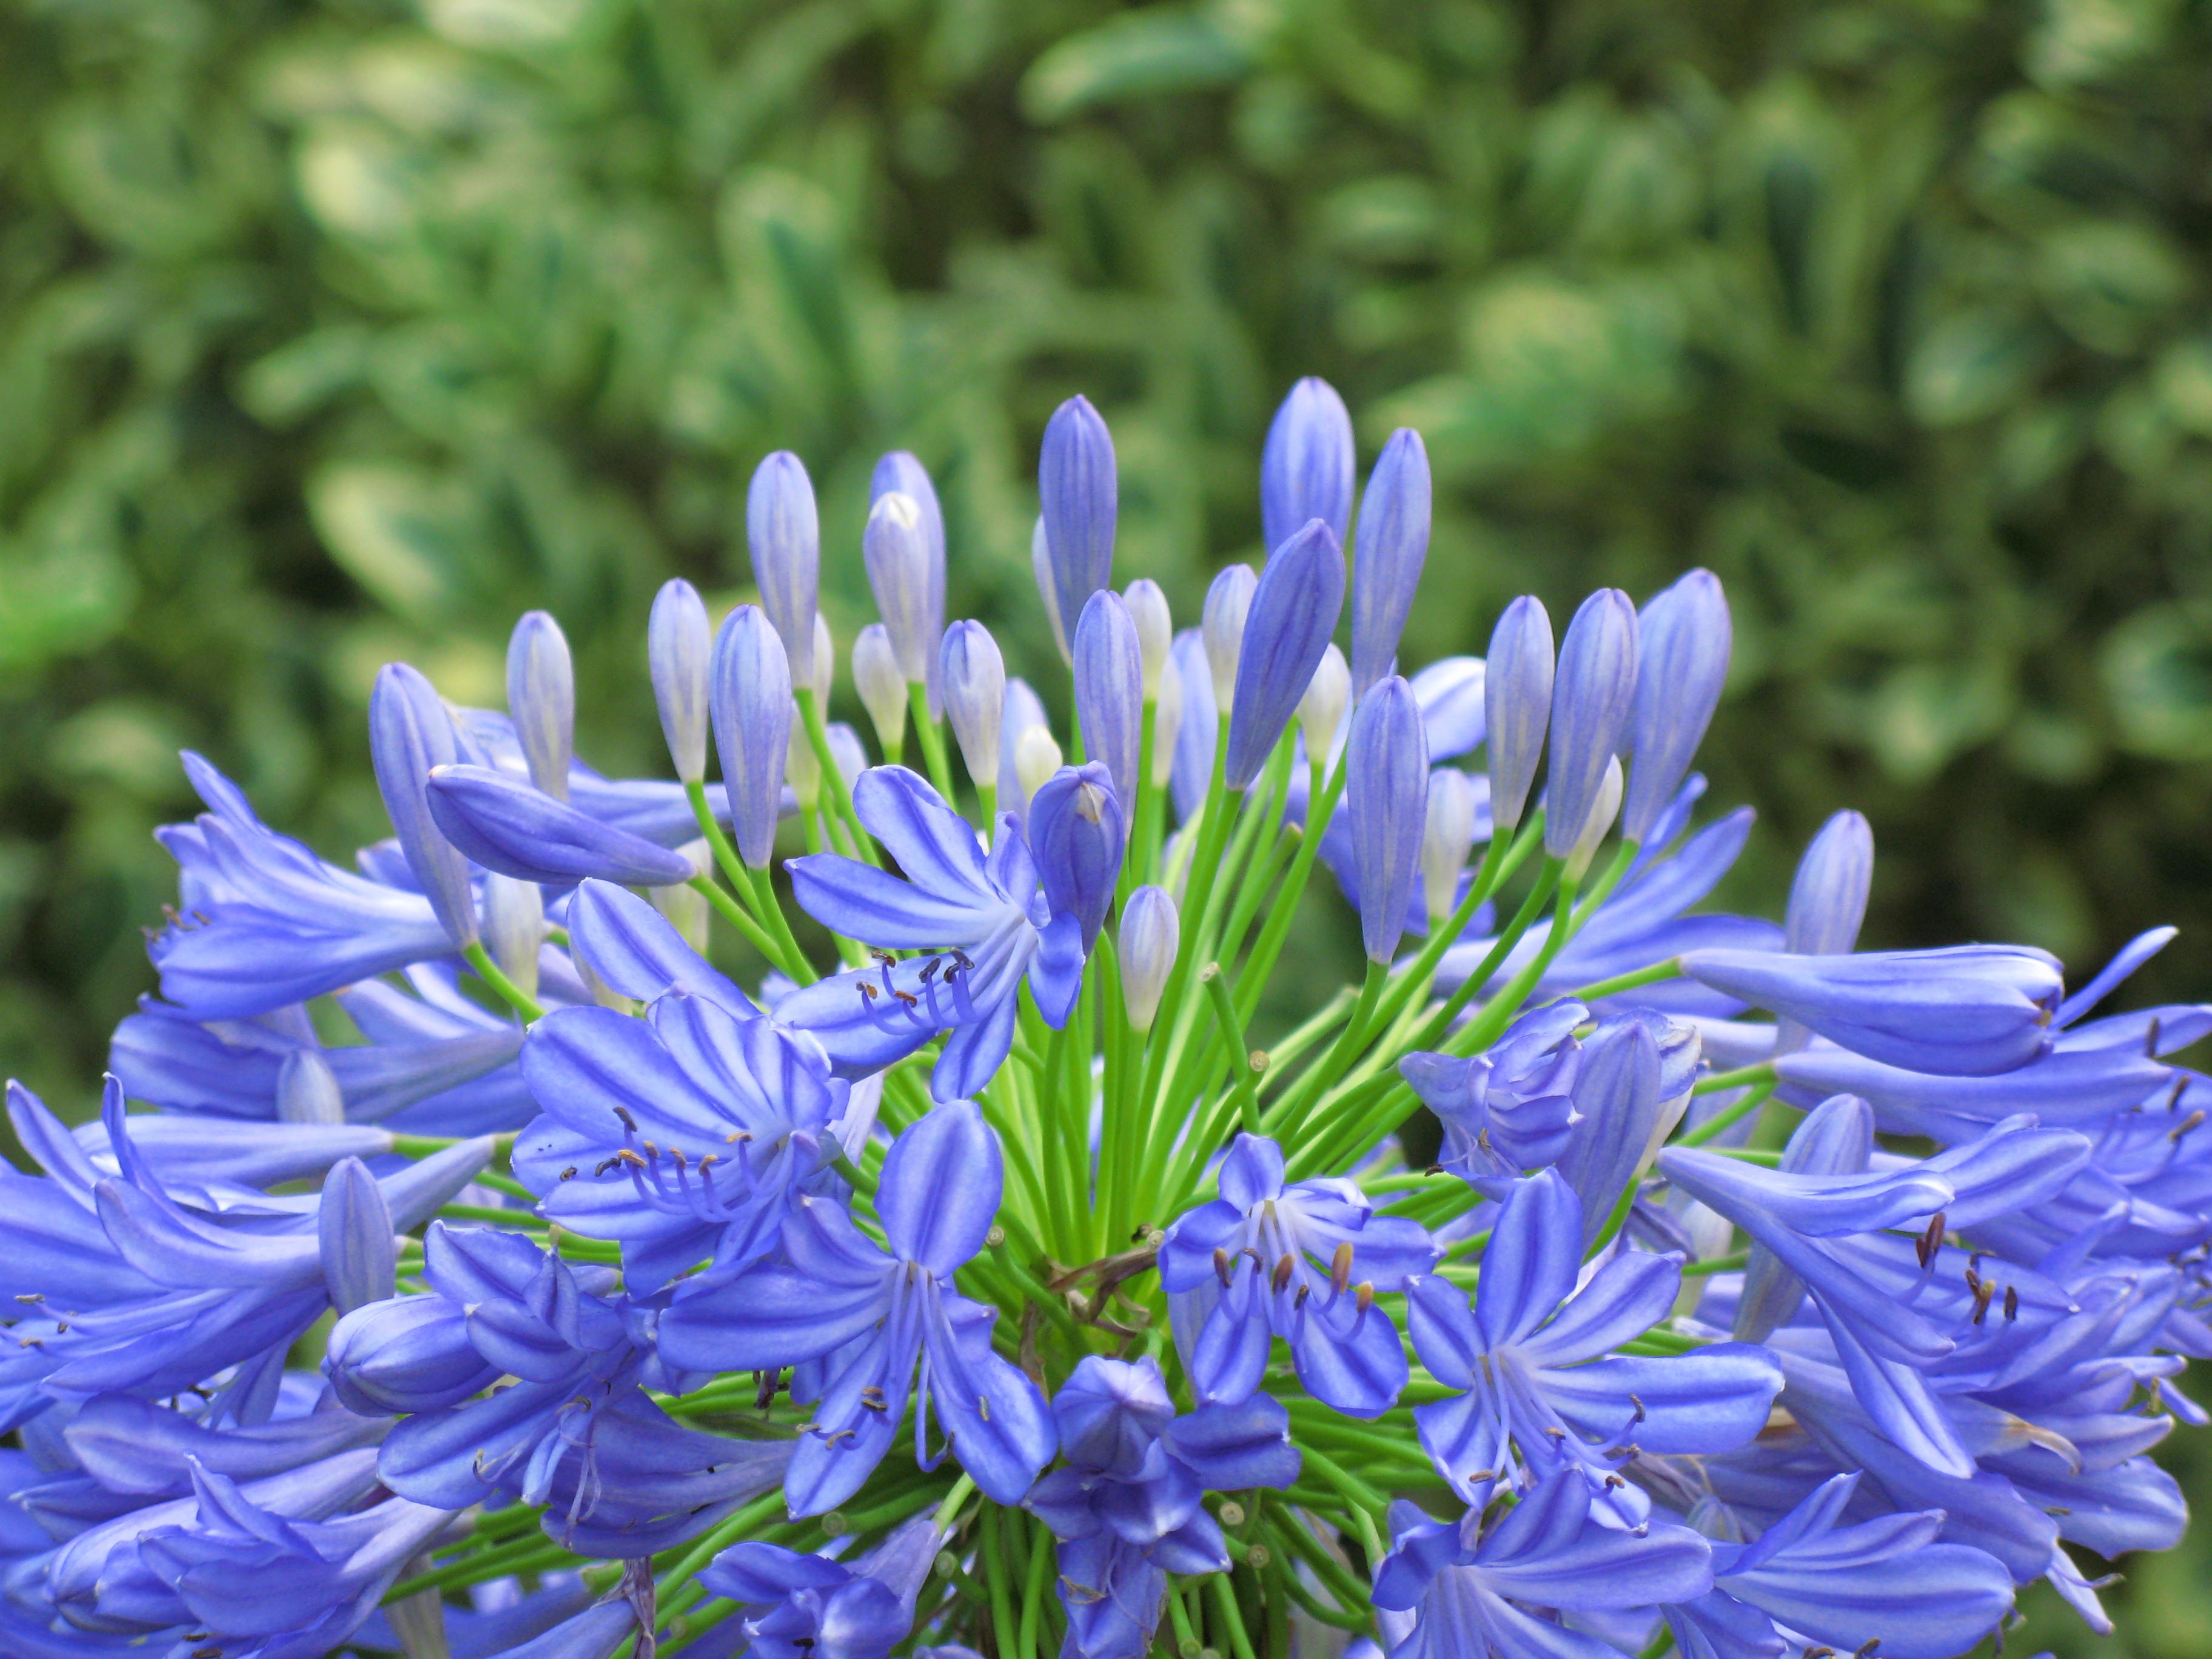 Free Images Blossom Flower High Herb Produce Botany Blue